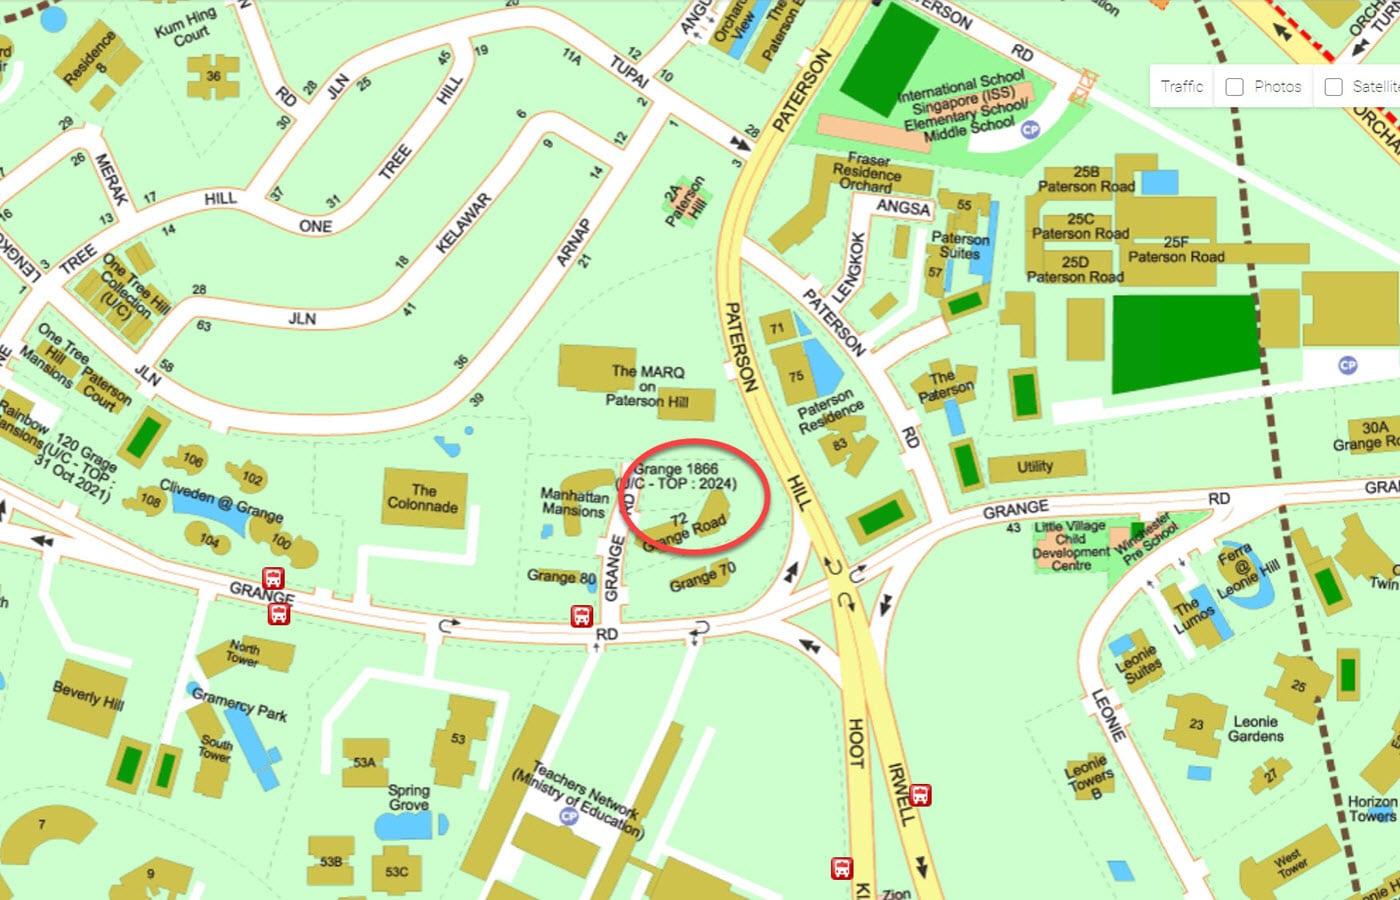 Grange 1866 - Street Directory Map